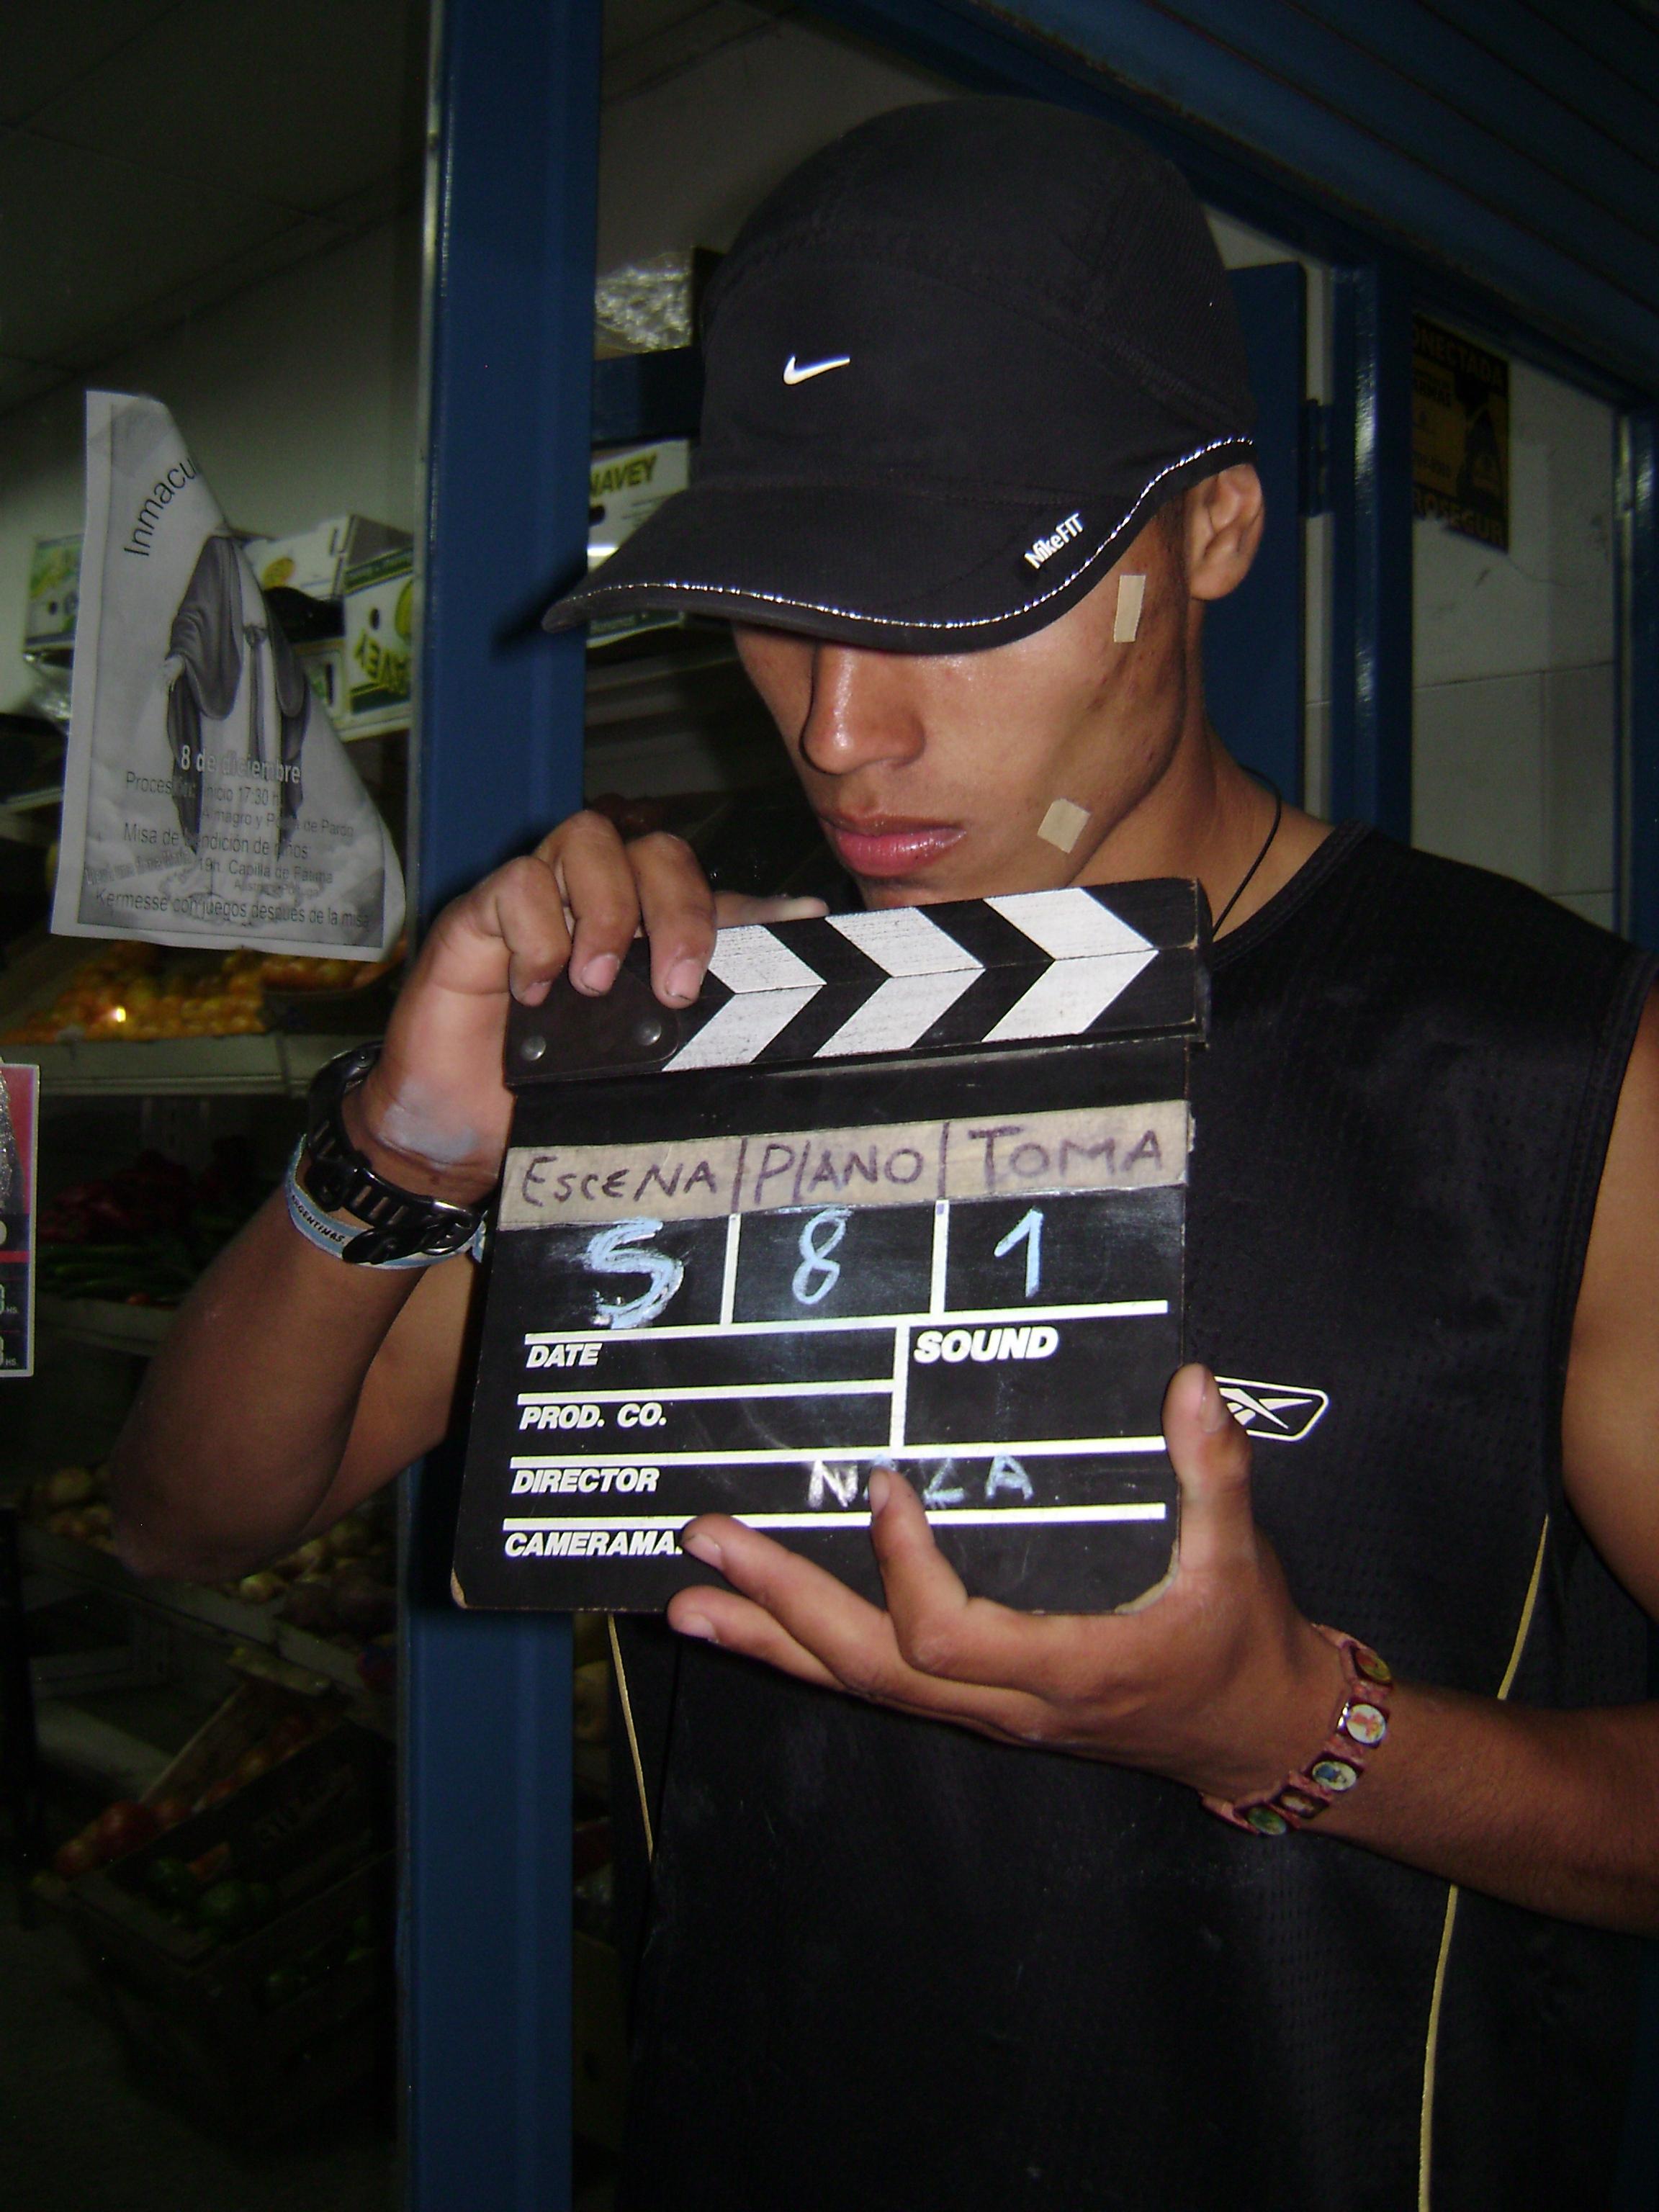 Muestra de cine en Chispita